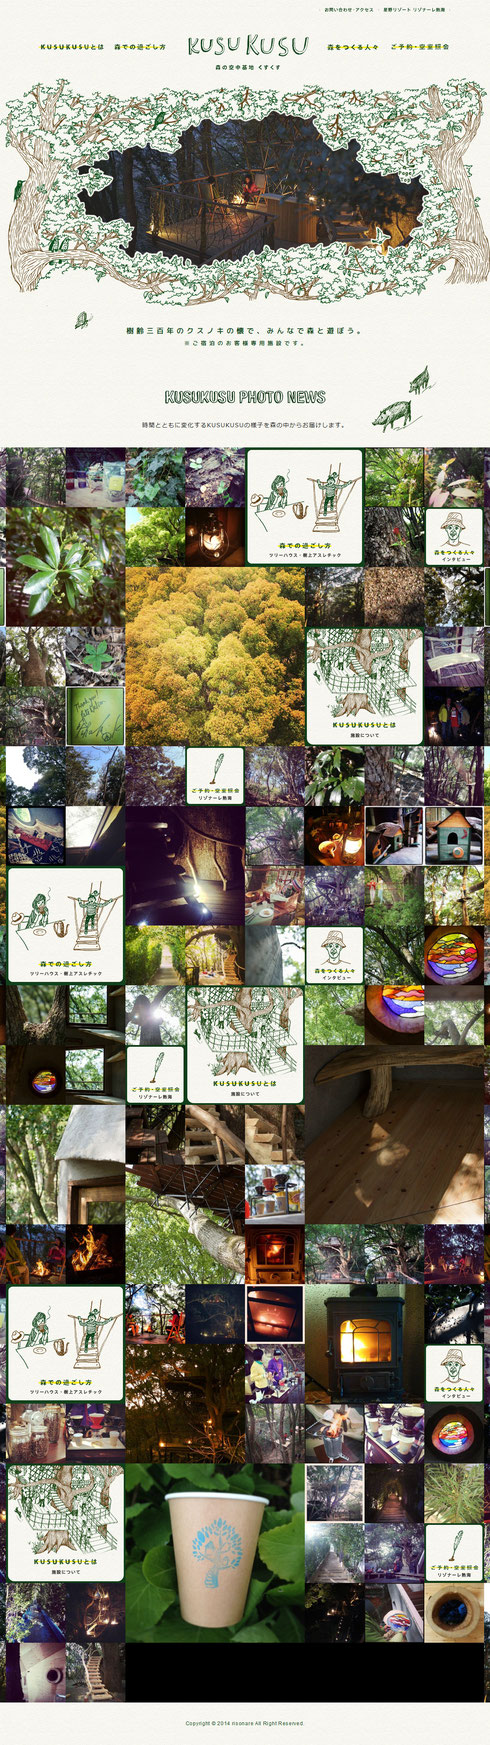 KUSUKUSU ~森の空中基地 くすくす~|星野リゾート リゾナーレ熱海